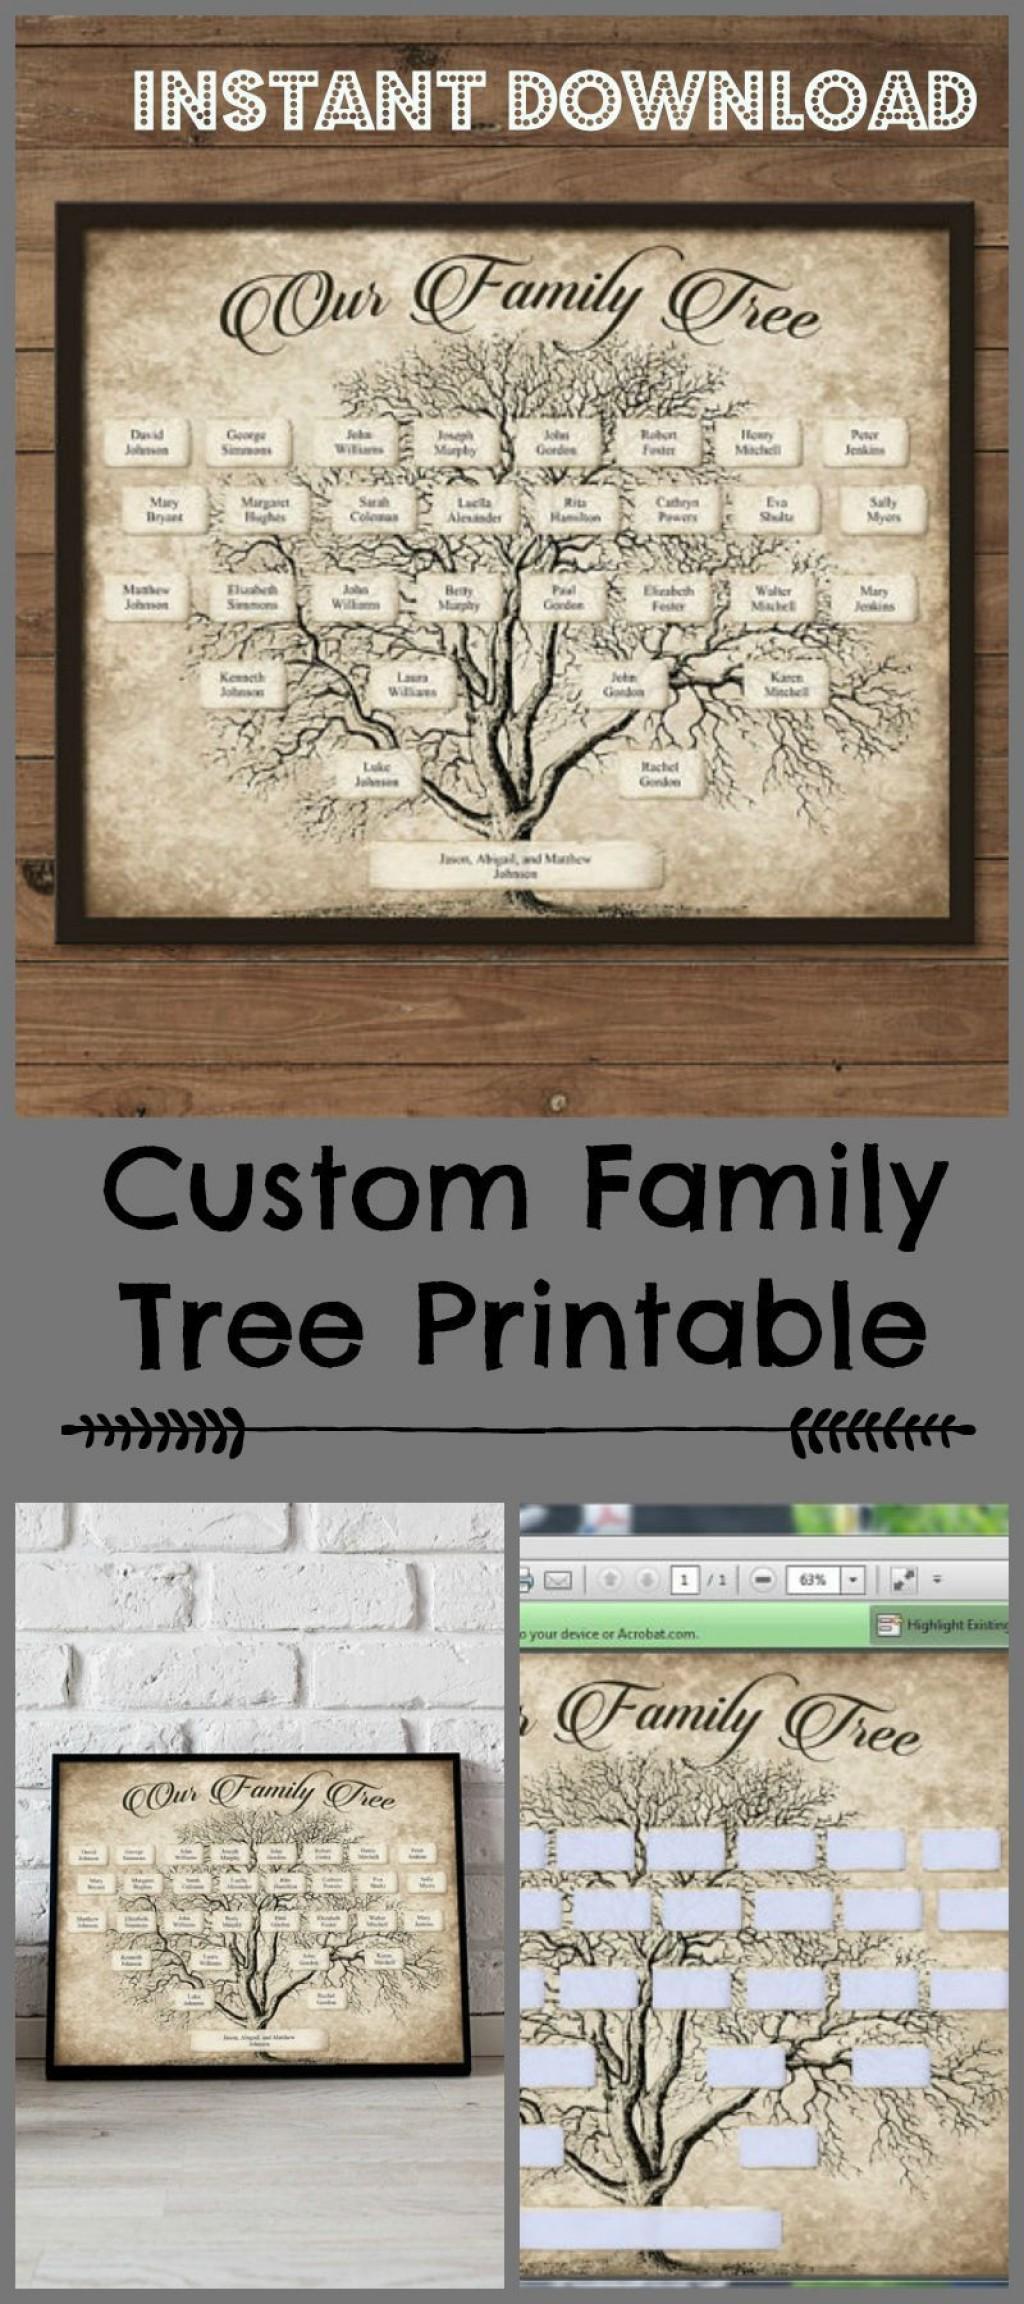 003 Stupendou Family Tree Book Template Sample  Photo FreeLarge